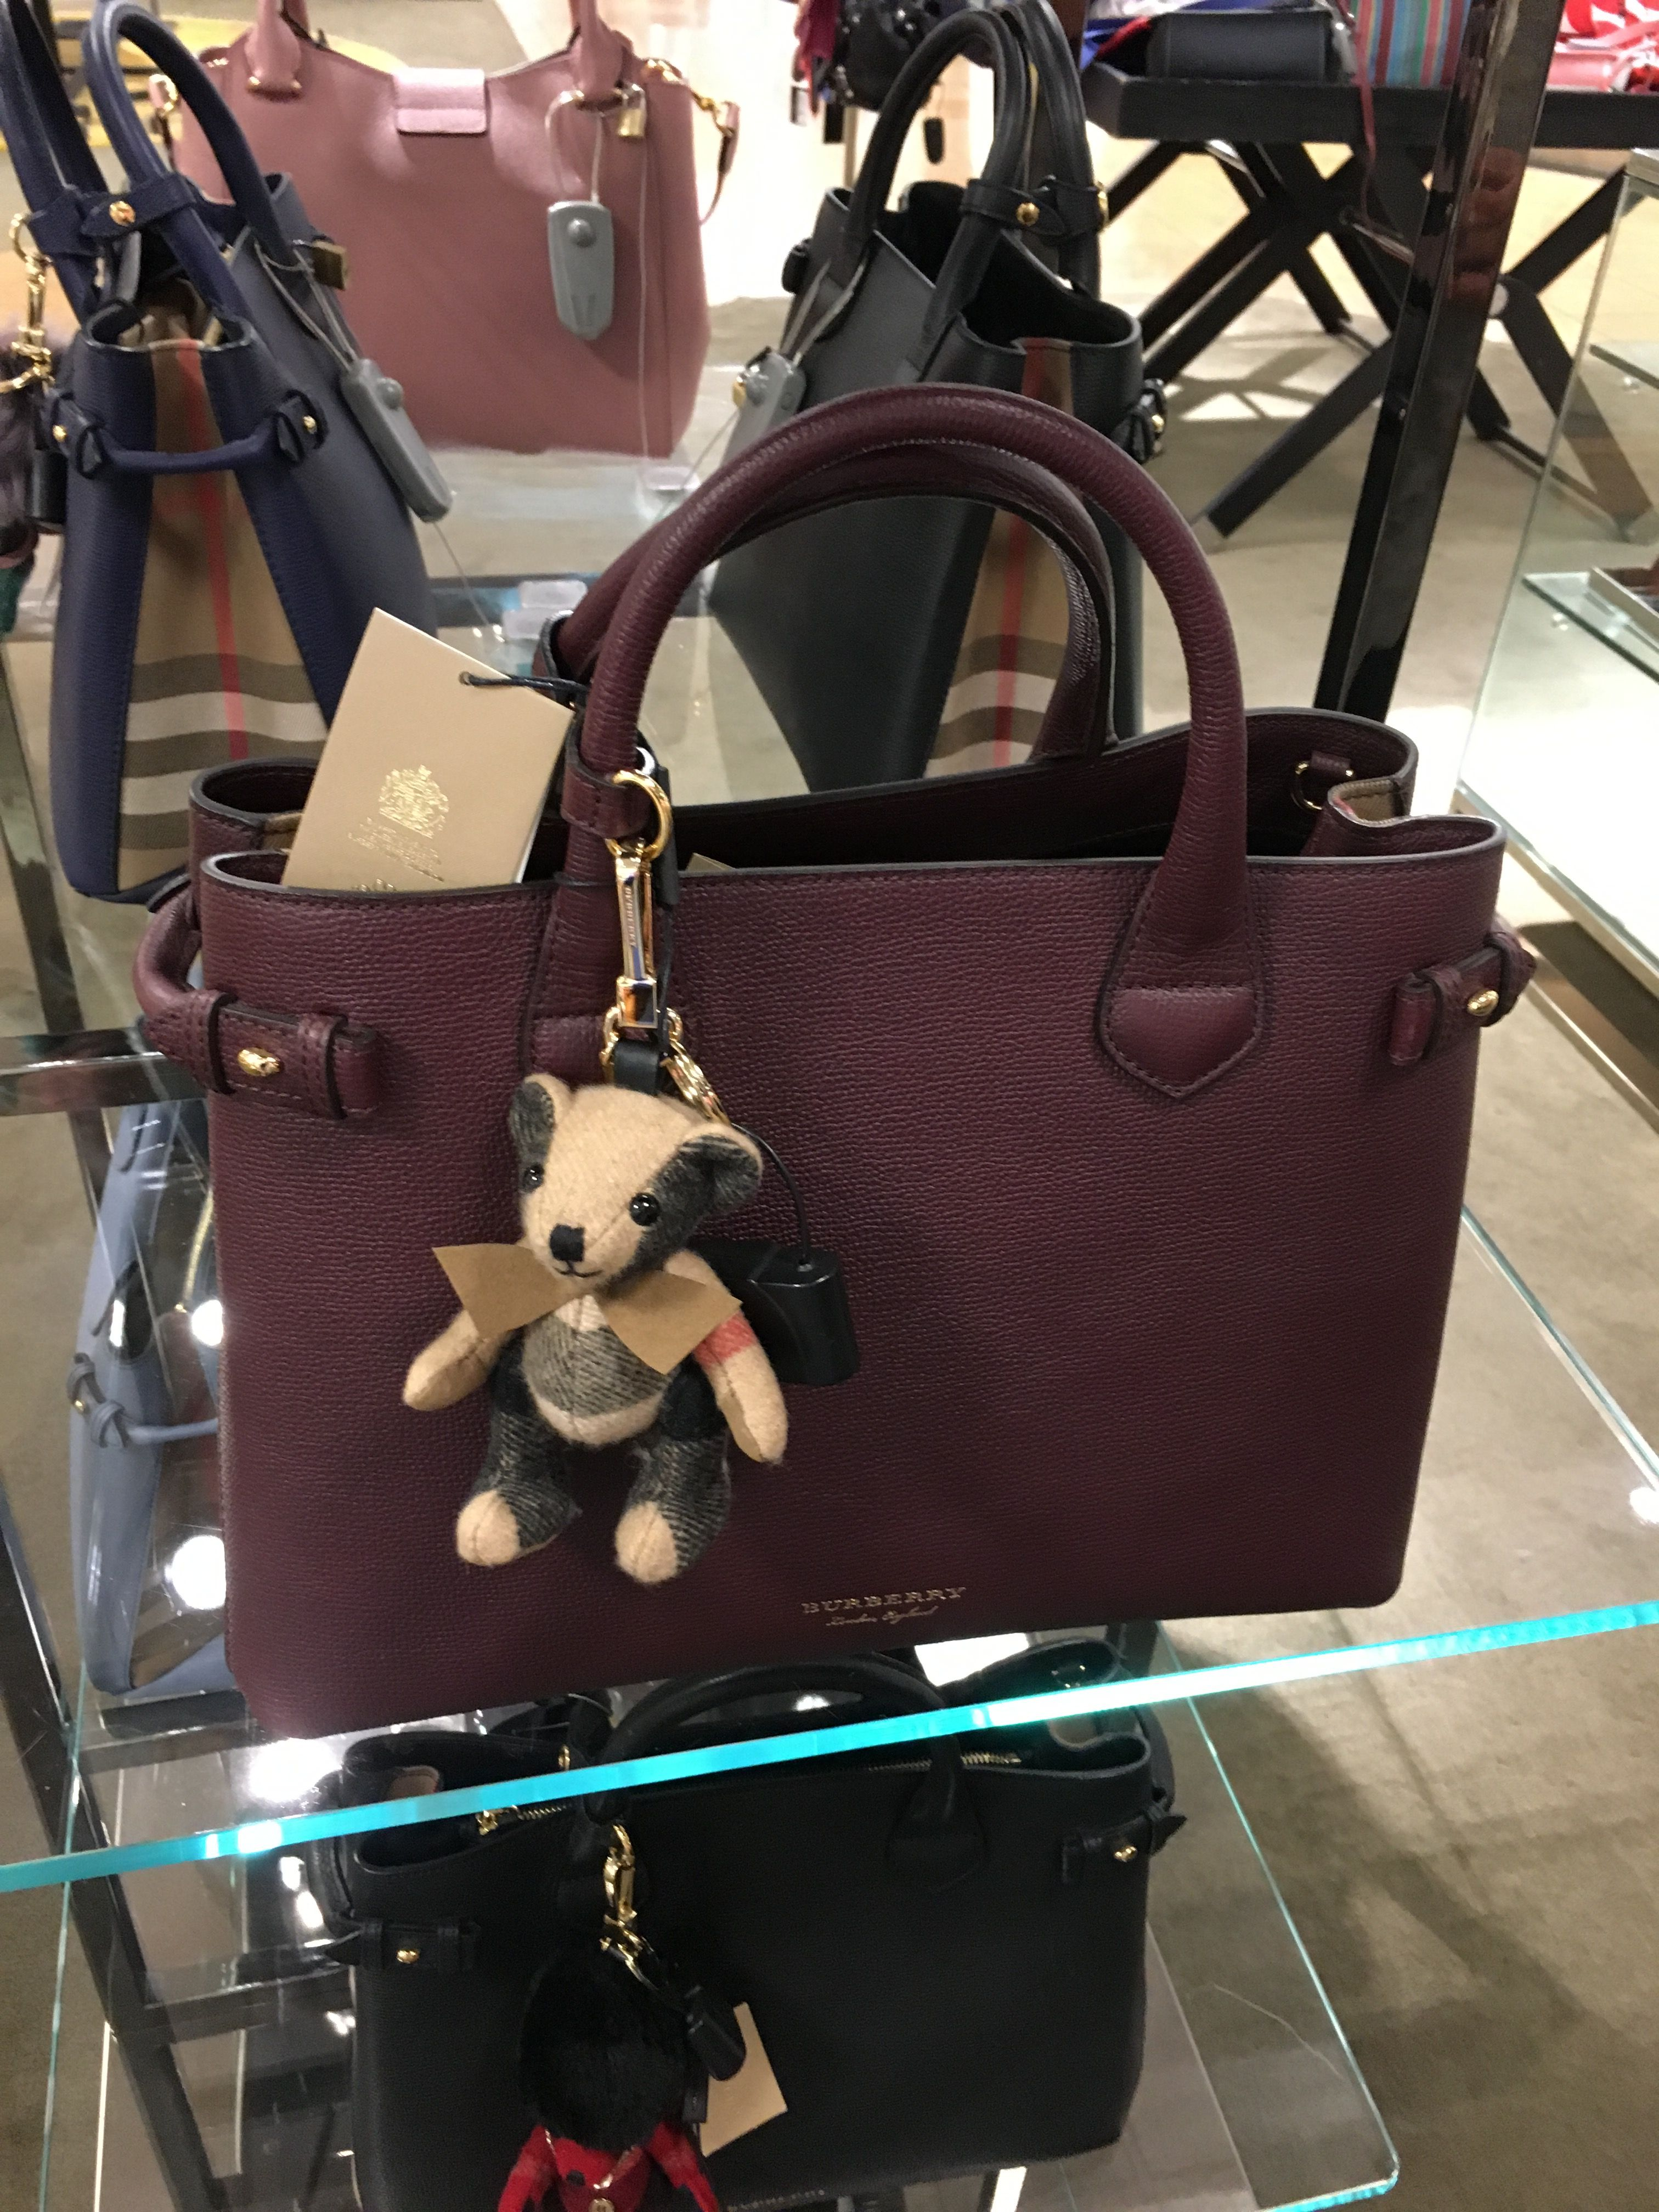 Burberry handbag 👜 and keycharm   Wish list   Pinterest   Burberry ... 3374bd2fe0